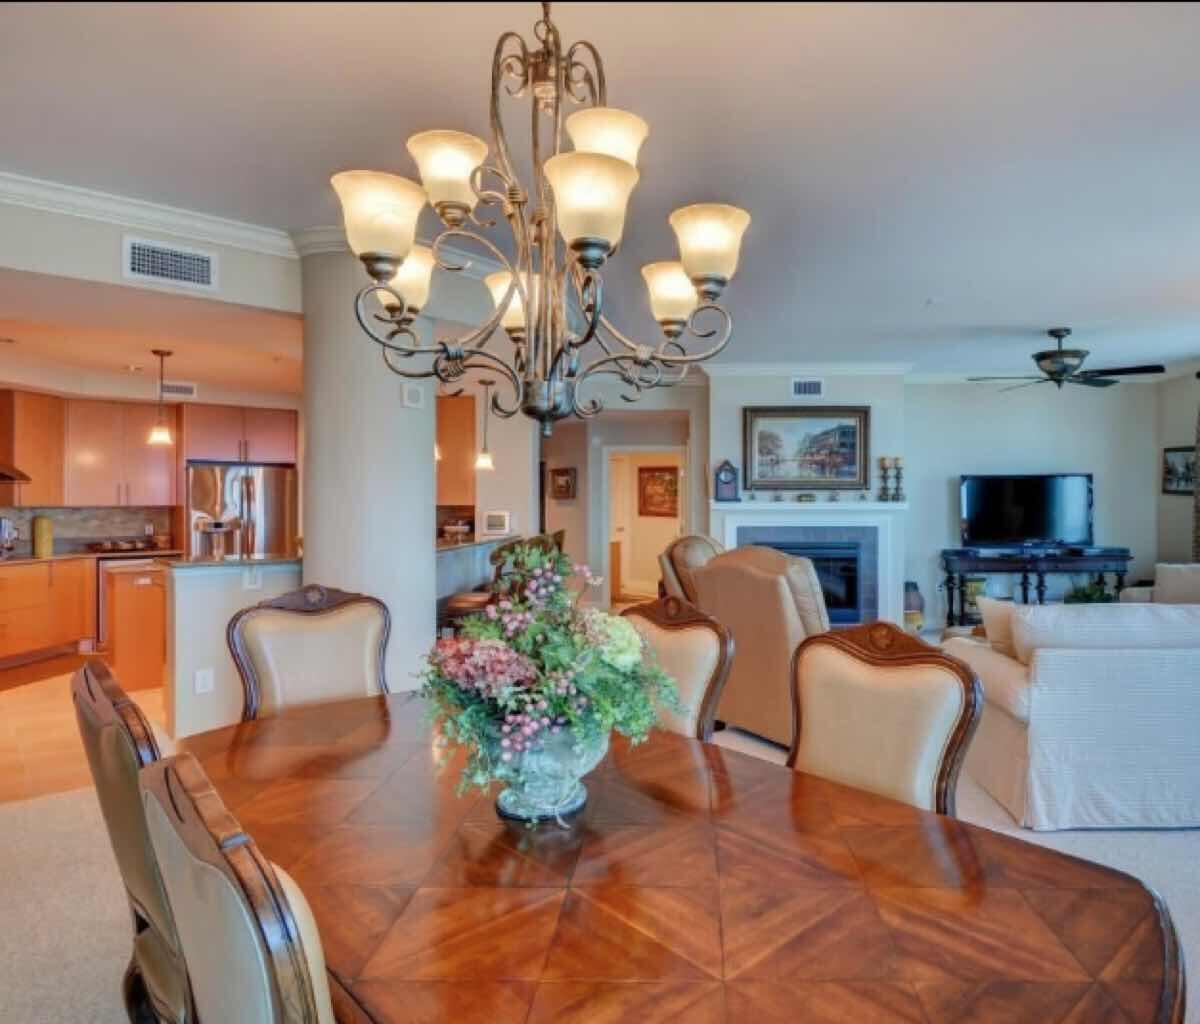 Nov 10 Model Home Furnishings And Decor Items For Sale Nextdoor